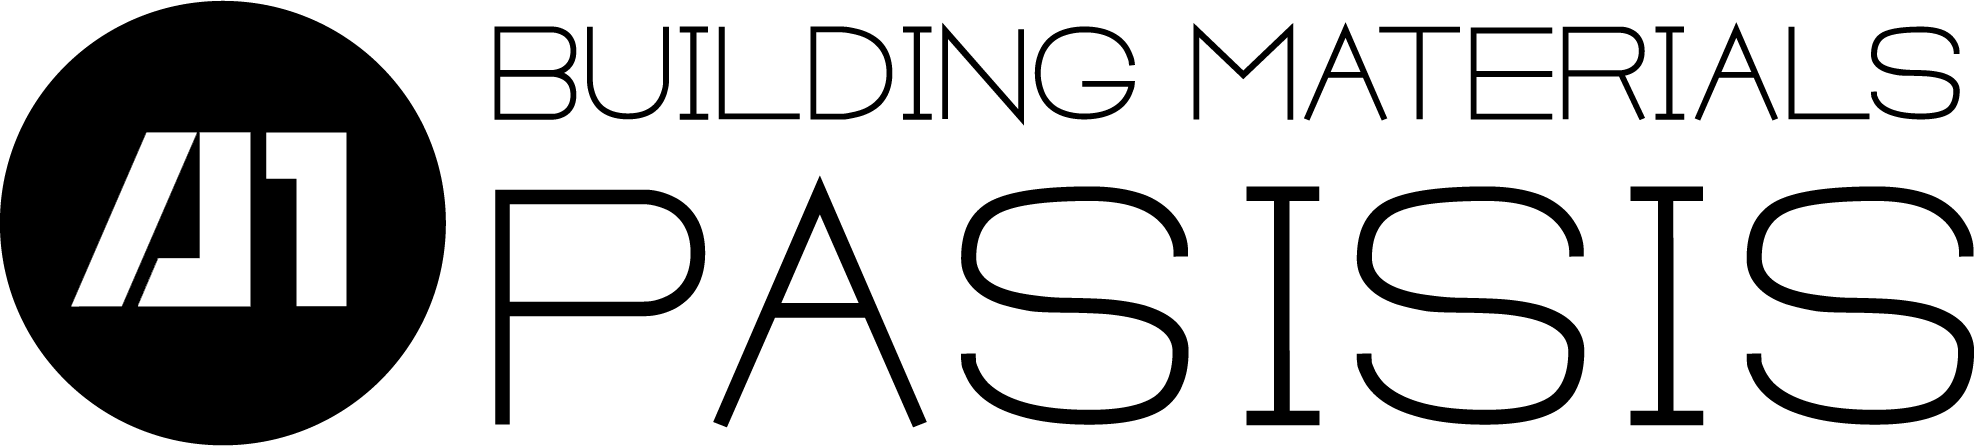 pasisis